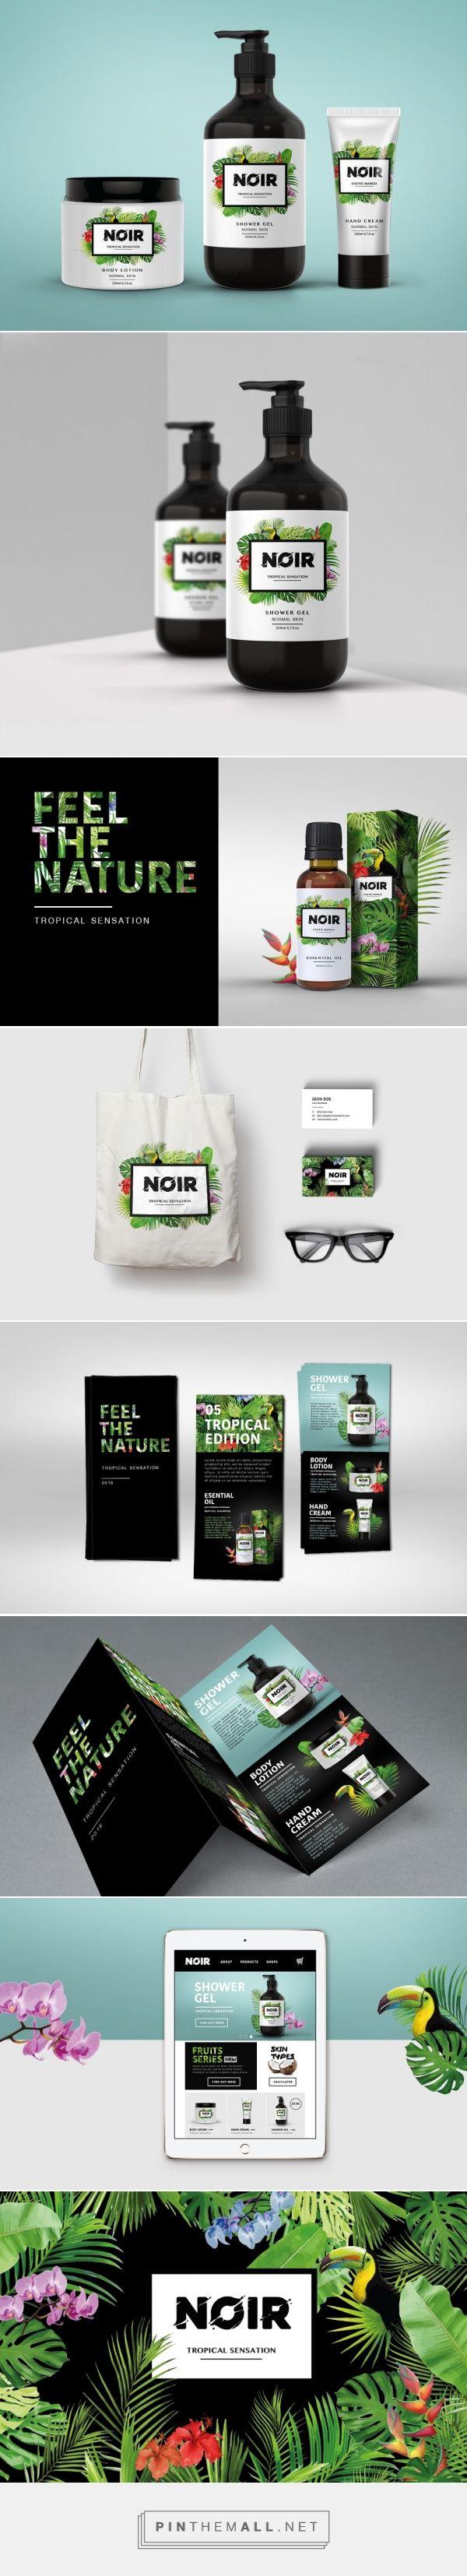 NOIR cosmetic packaging concept designed by Orsolya Hegedus (UK) - http://www.packagingoftheworld.com/2016/04/noir-packaging-concept.html